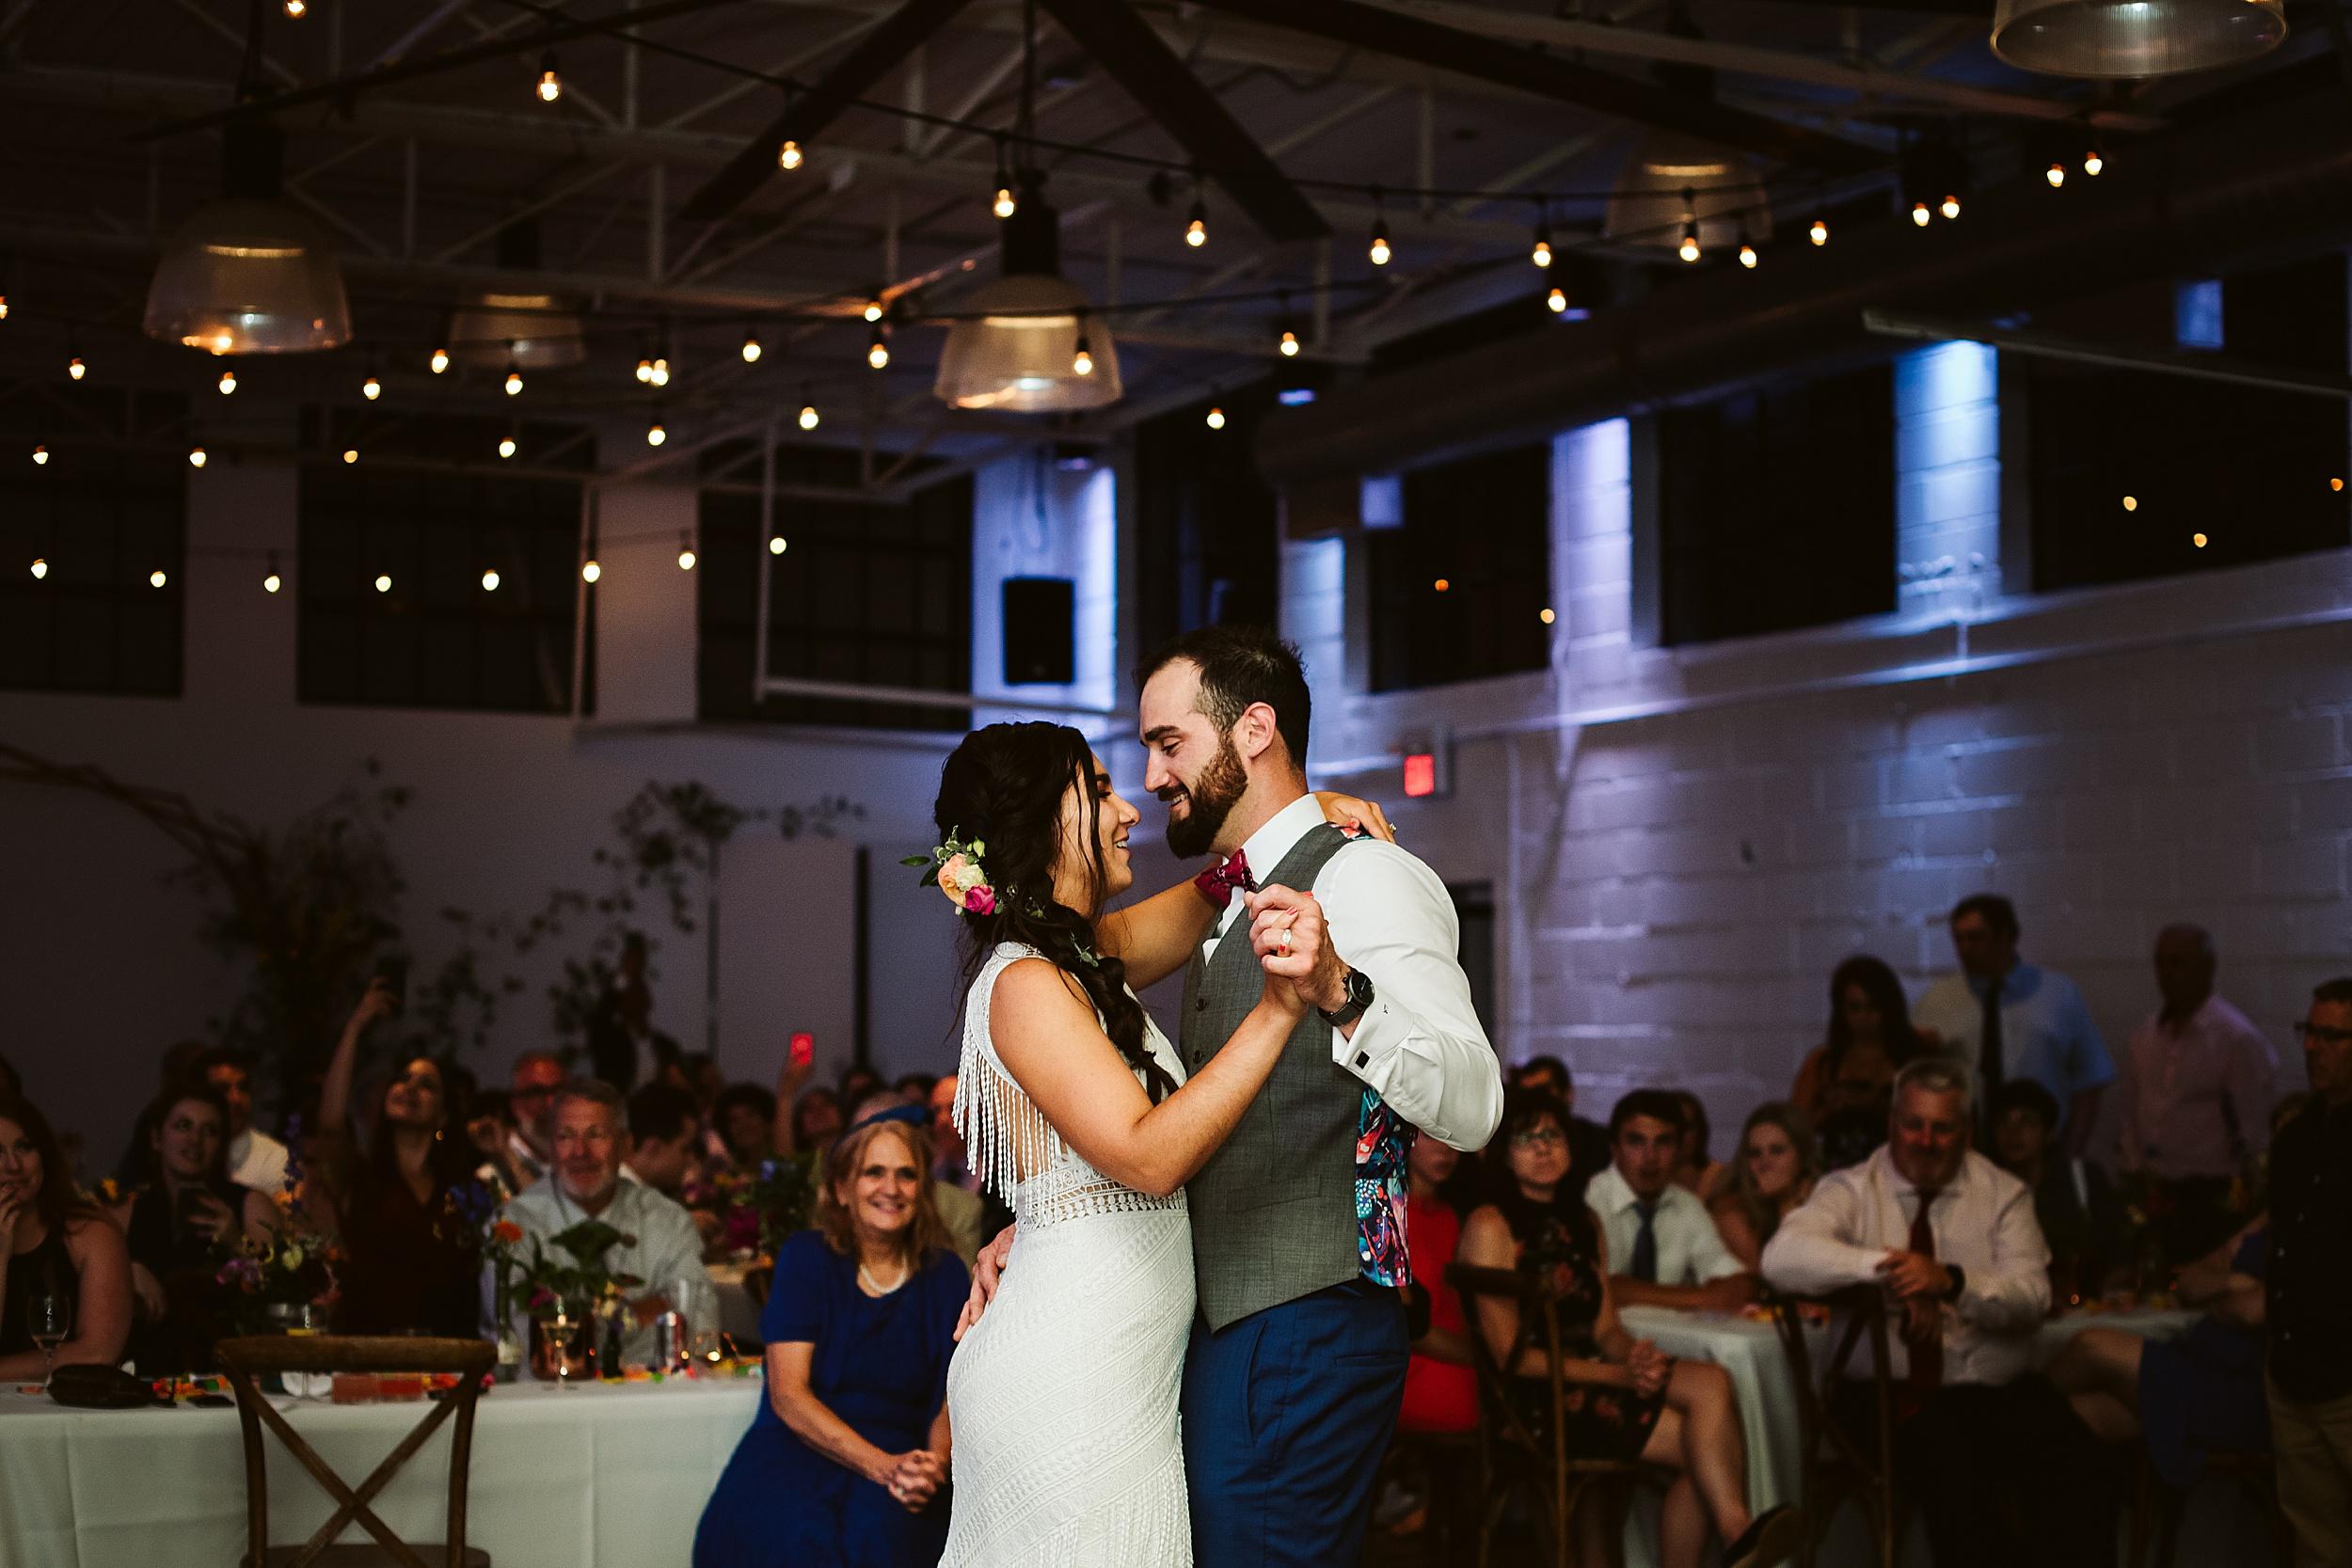 Airship-37-Berkeley-Events-Distillery-District-Wedding-Toronto-Wedding-Photographers_0104.jpg